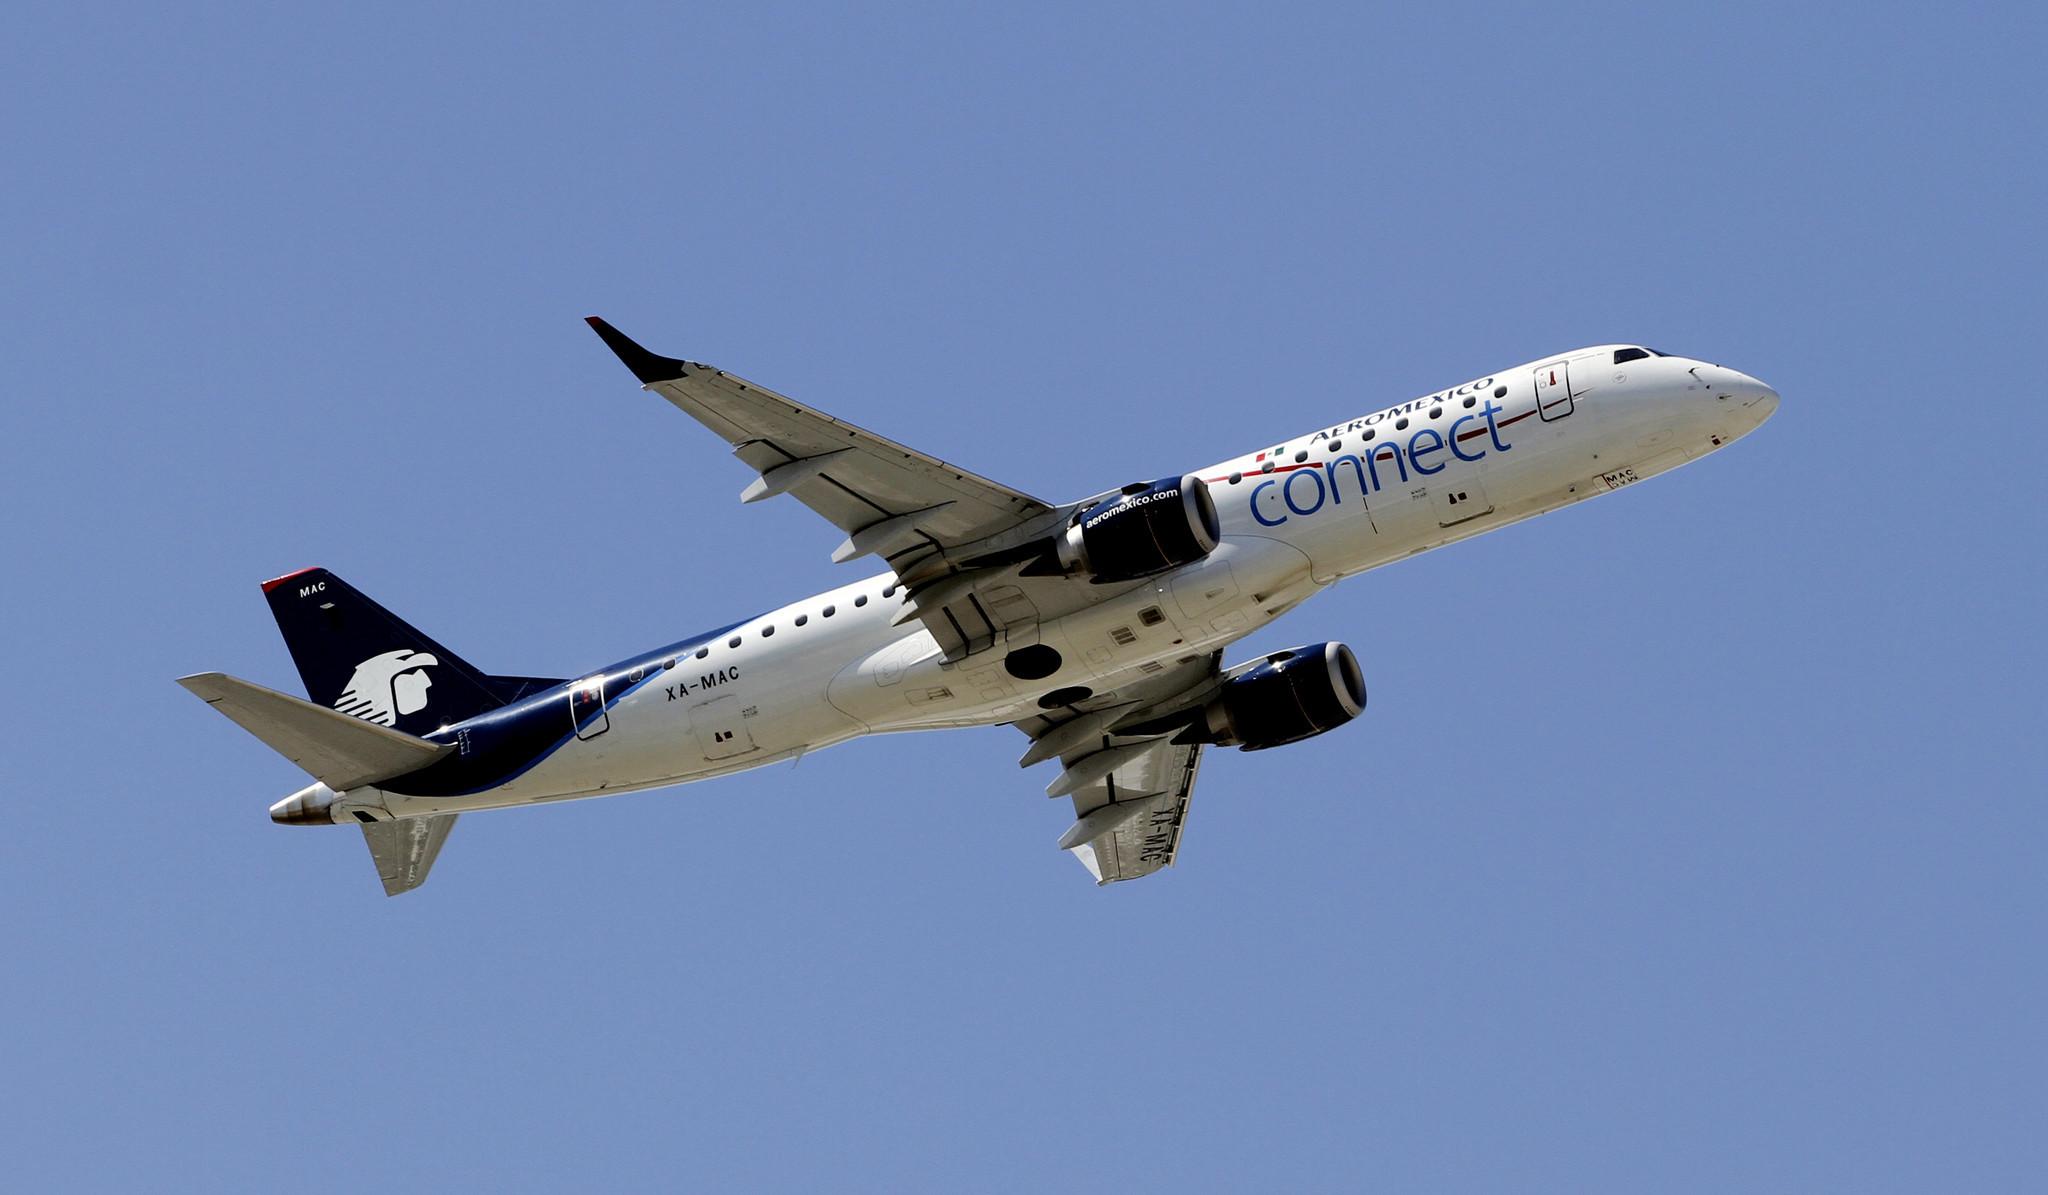 Boeing 737 damaged in possible drone crash near U.S.-Mexico border